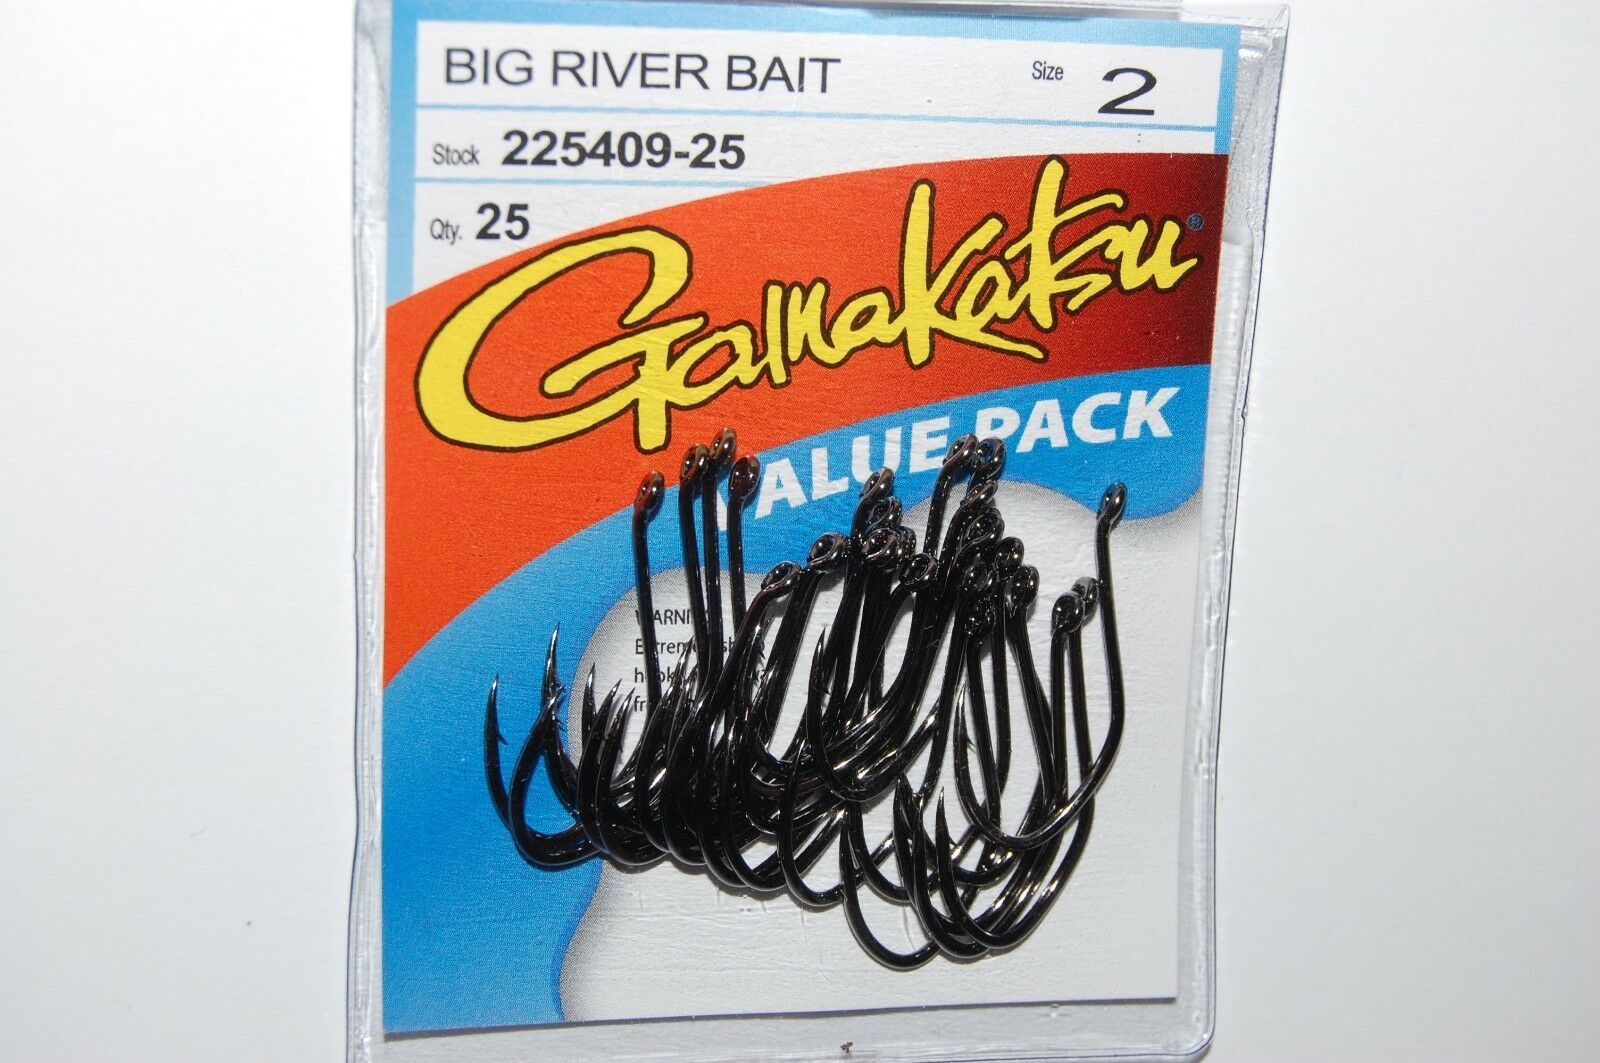 Gamakatsu Big River Bait NS BLACK Hooks Value Pack 225412-25 25 pack size 2//0